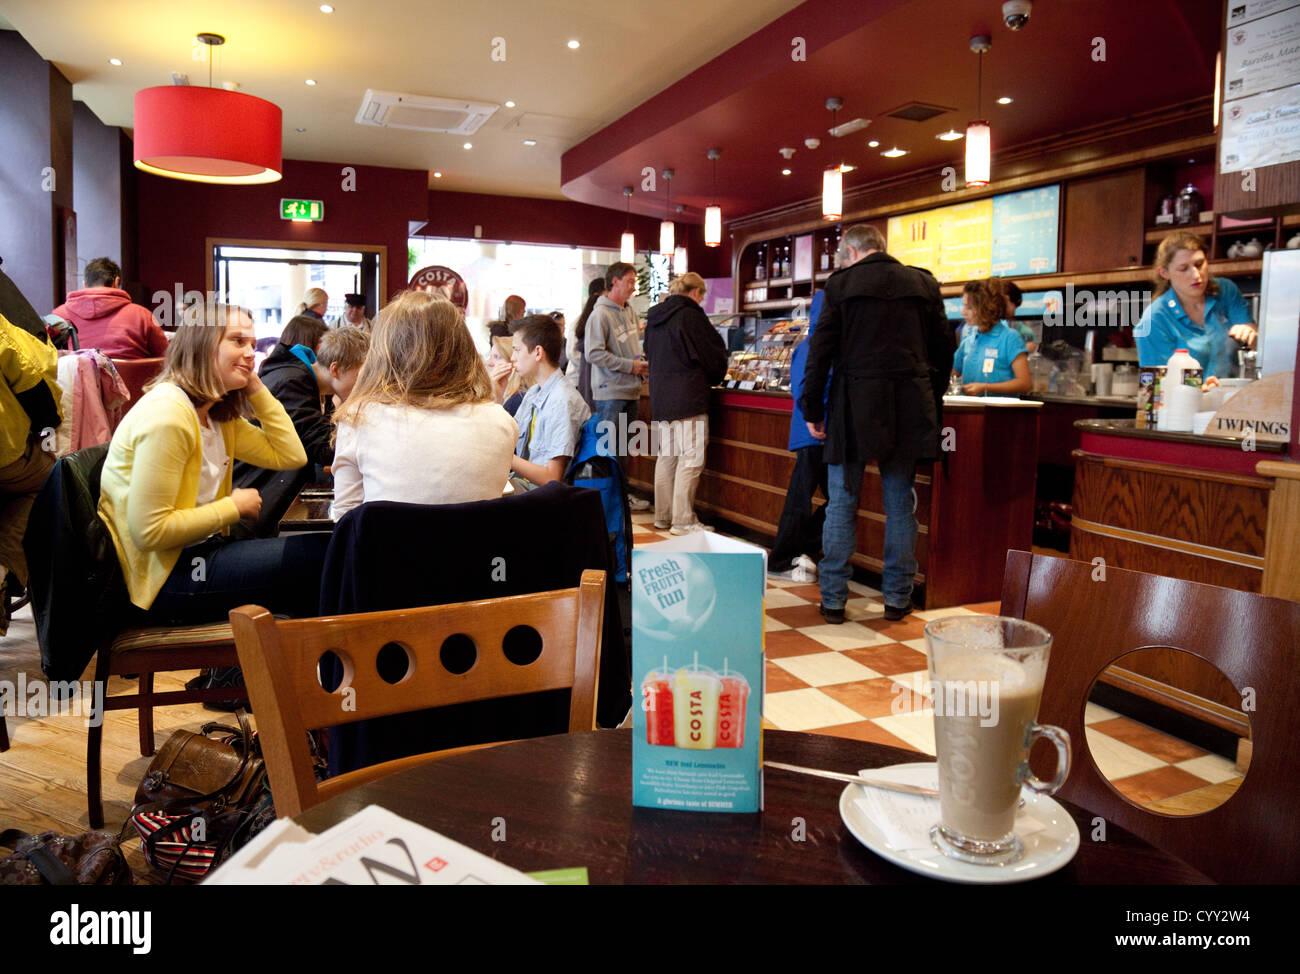 Interieur der Costa Coffee bar, City Center, Bath, Somerset UK Stockfoto